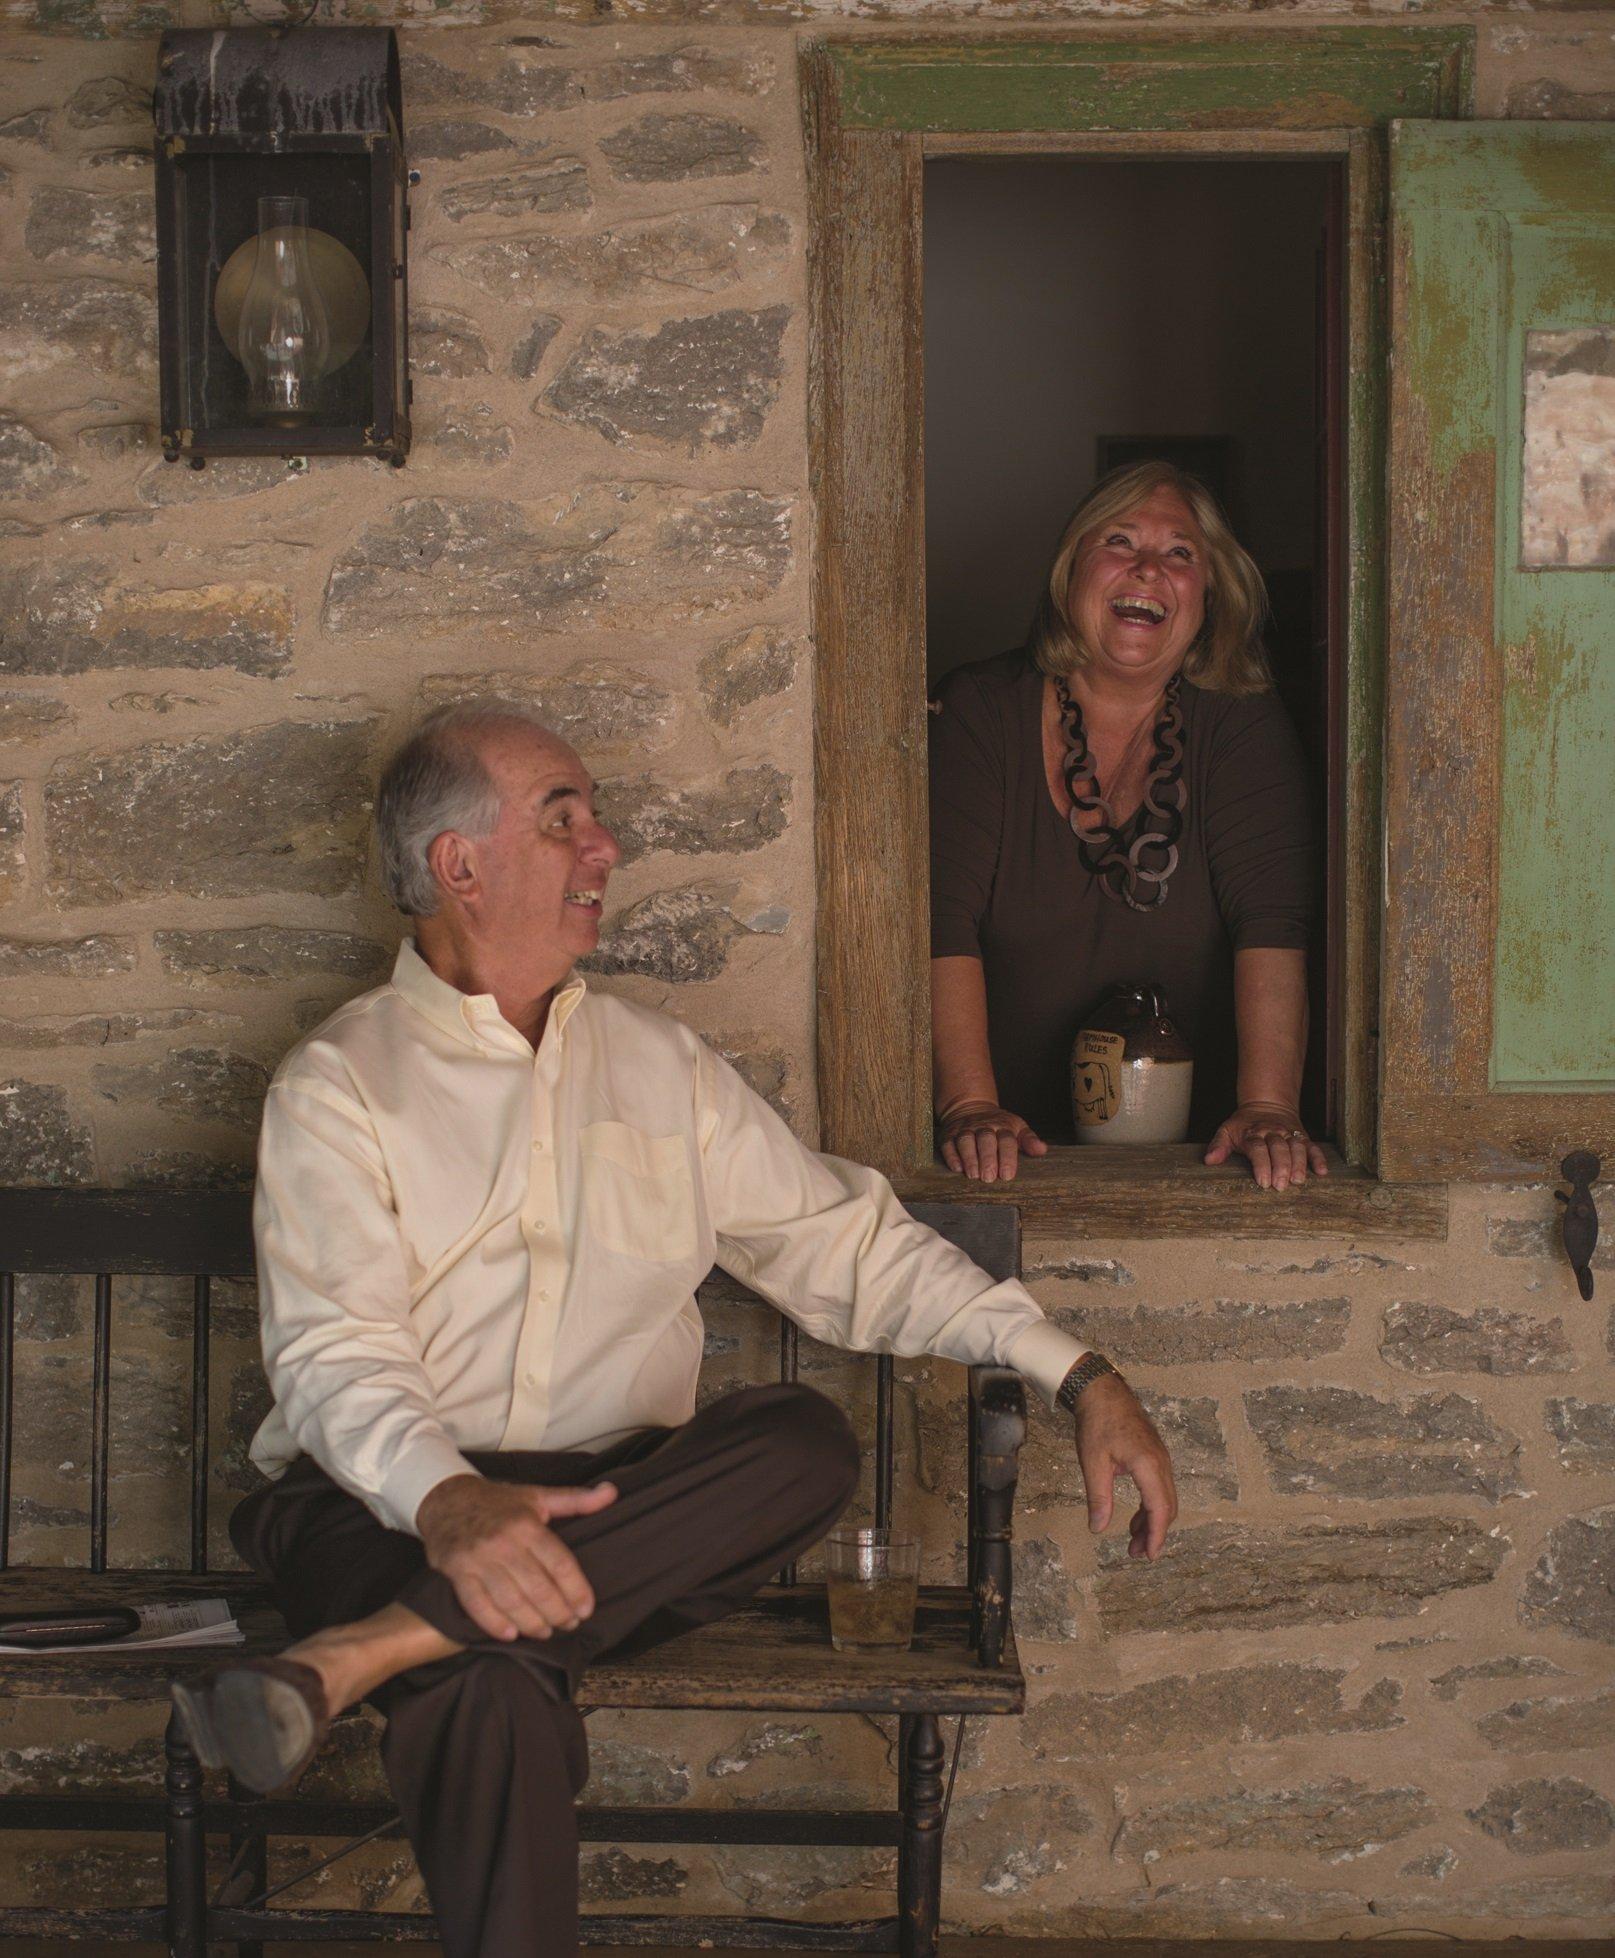 Farmhouse Rules Simple Seasonal Meals For The Whole Family Fuller Nancy Prescott Jamie 9781455531059 Amazon Com Books